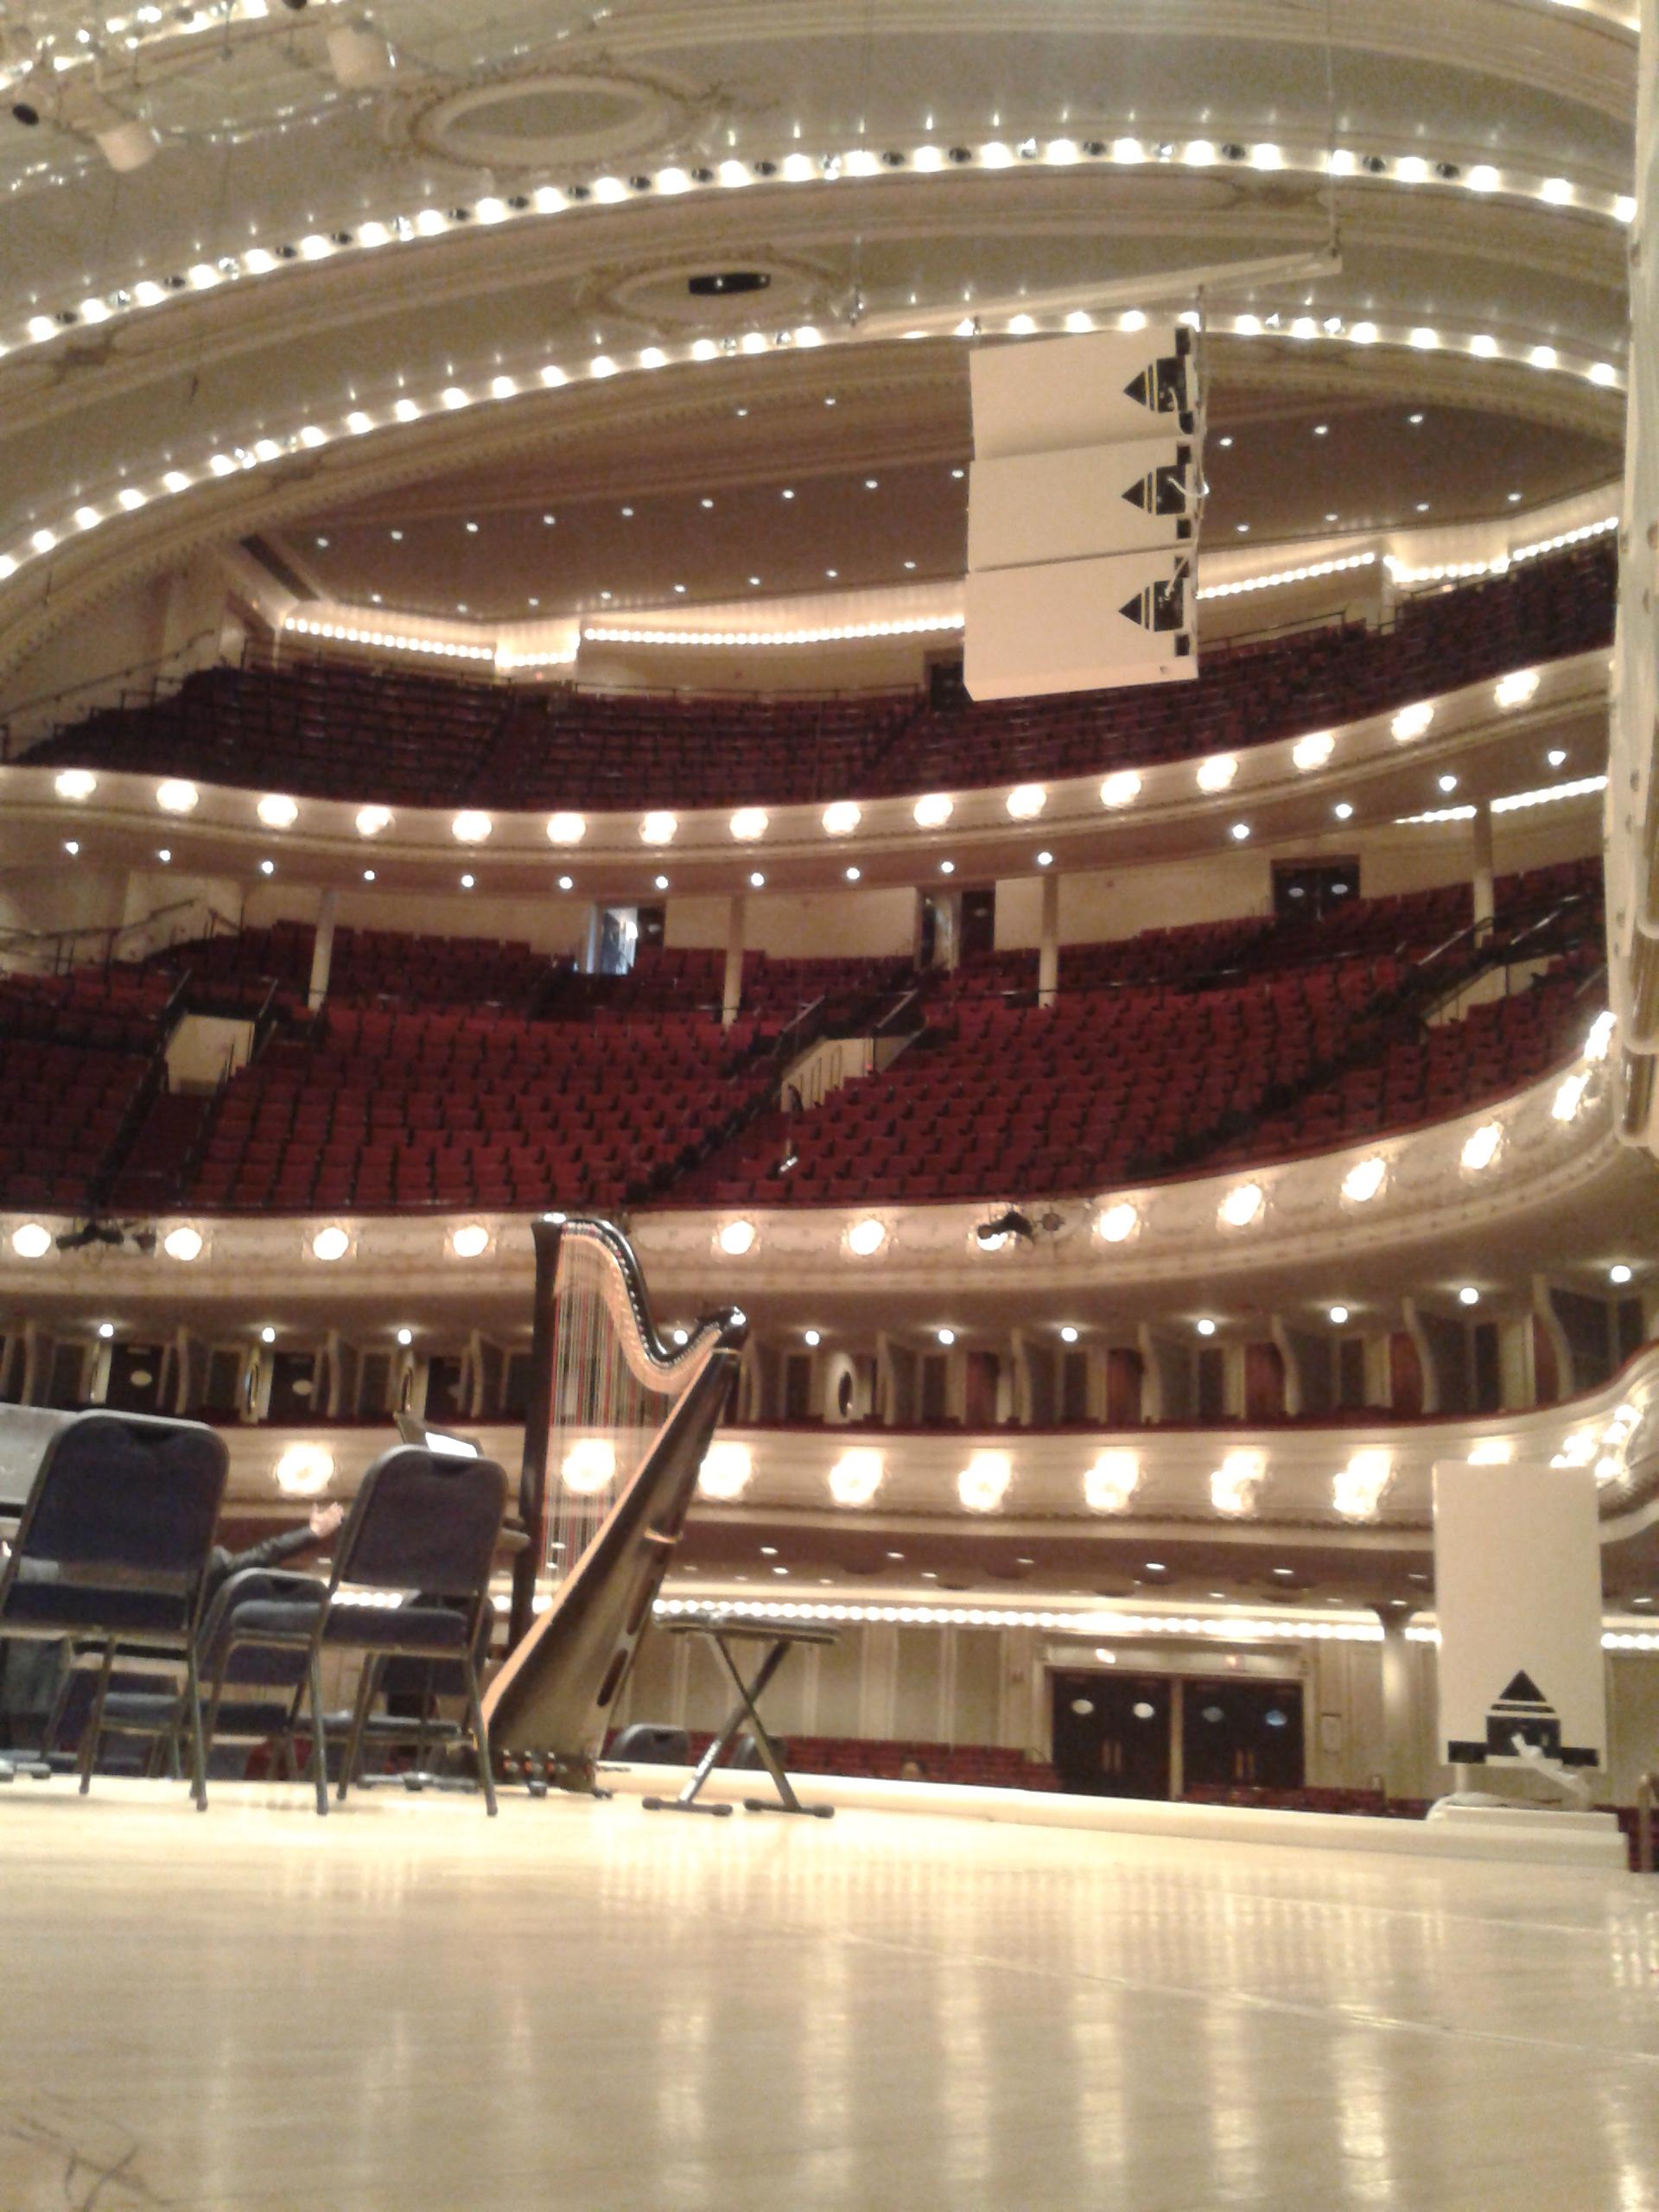 At Symphony Center